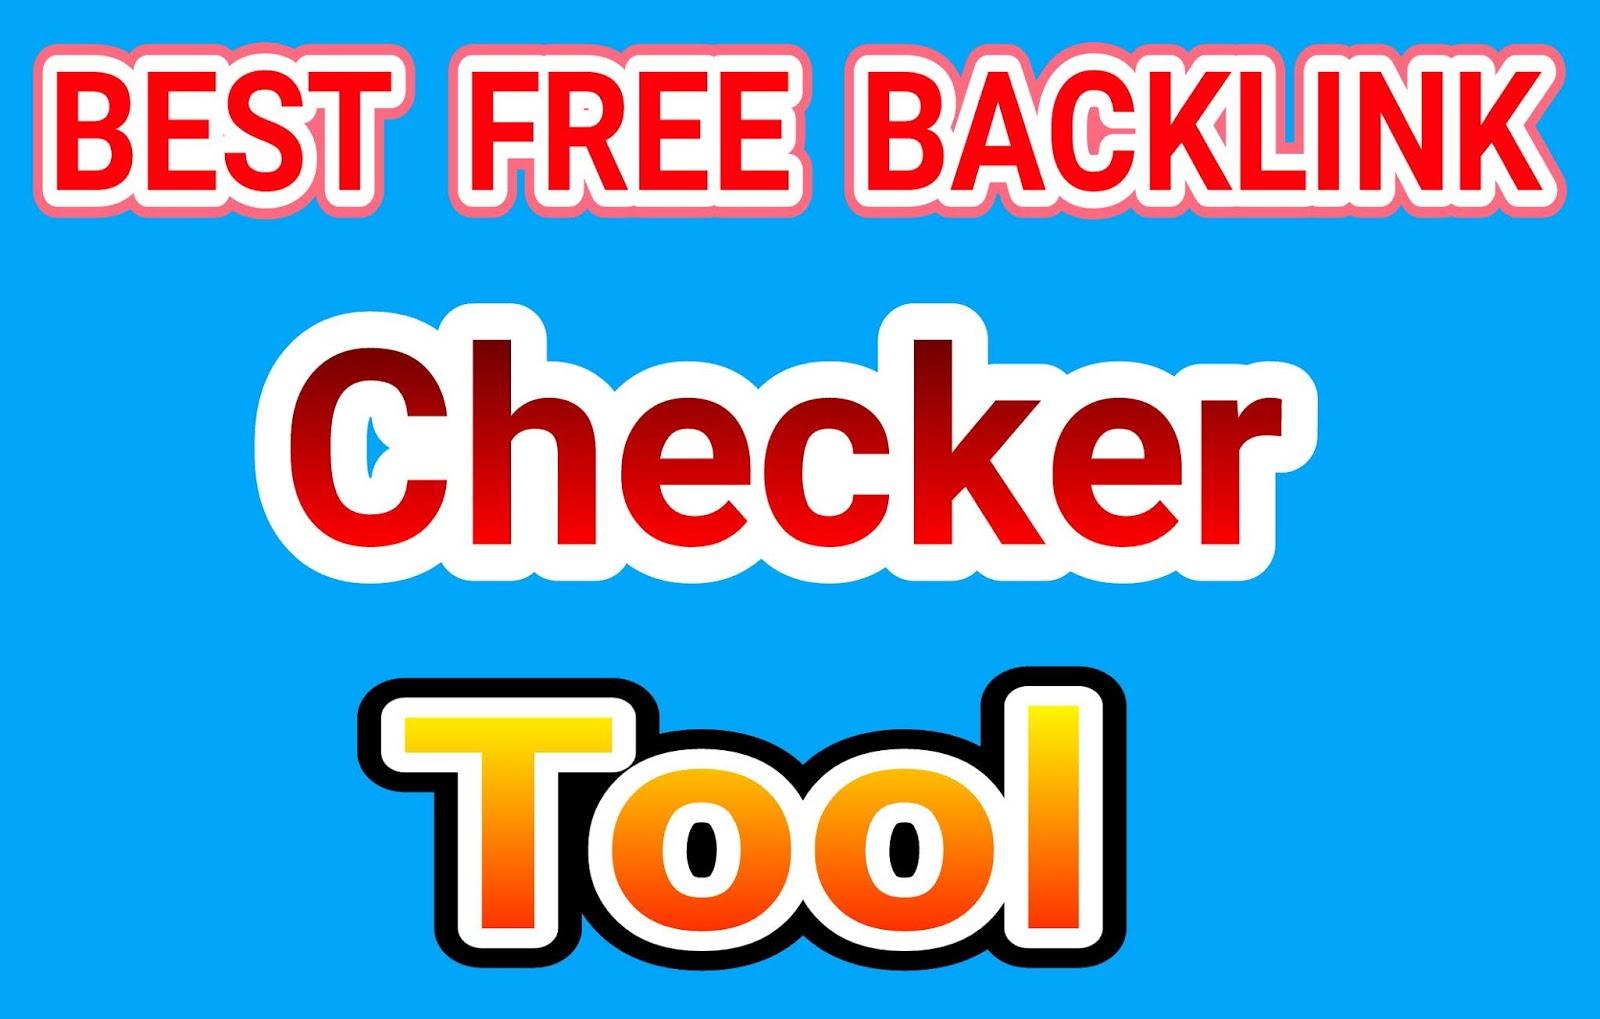 Best free Backlink checker tool